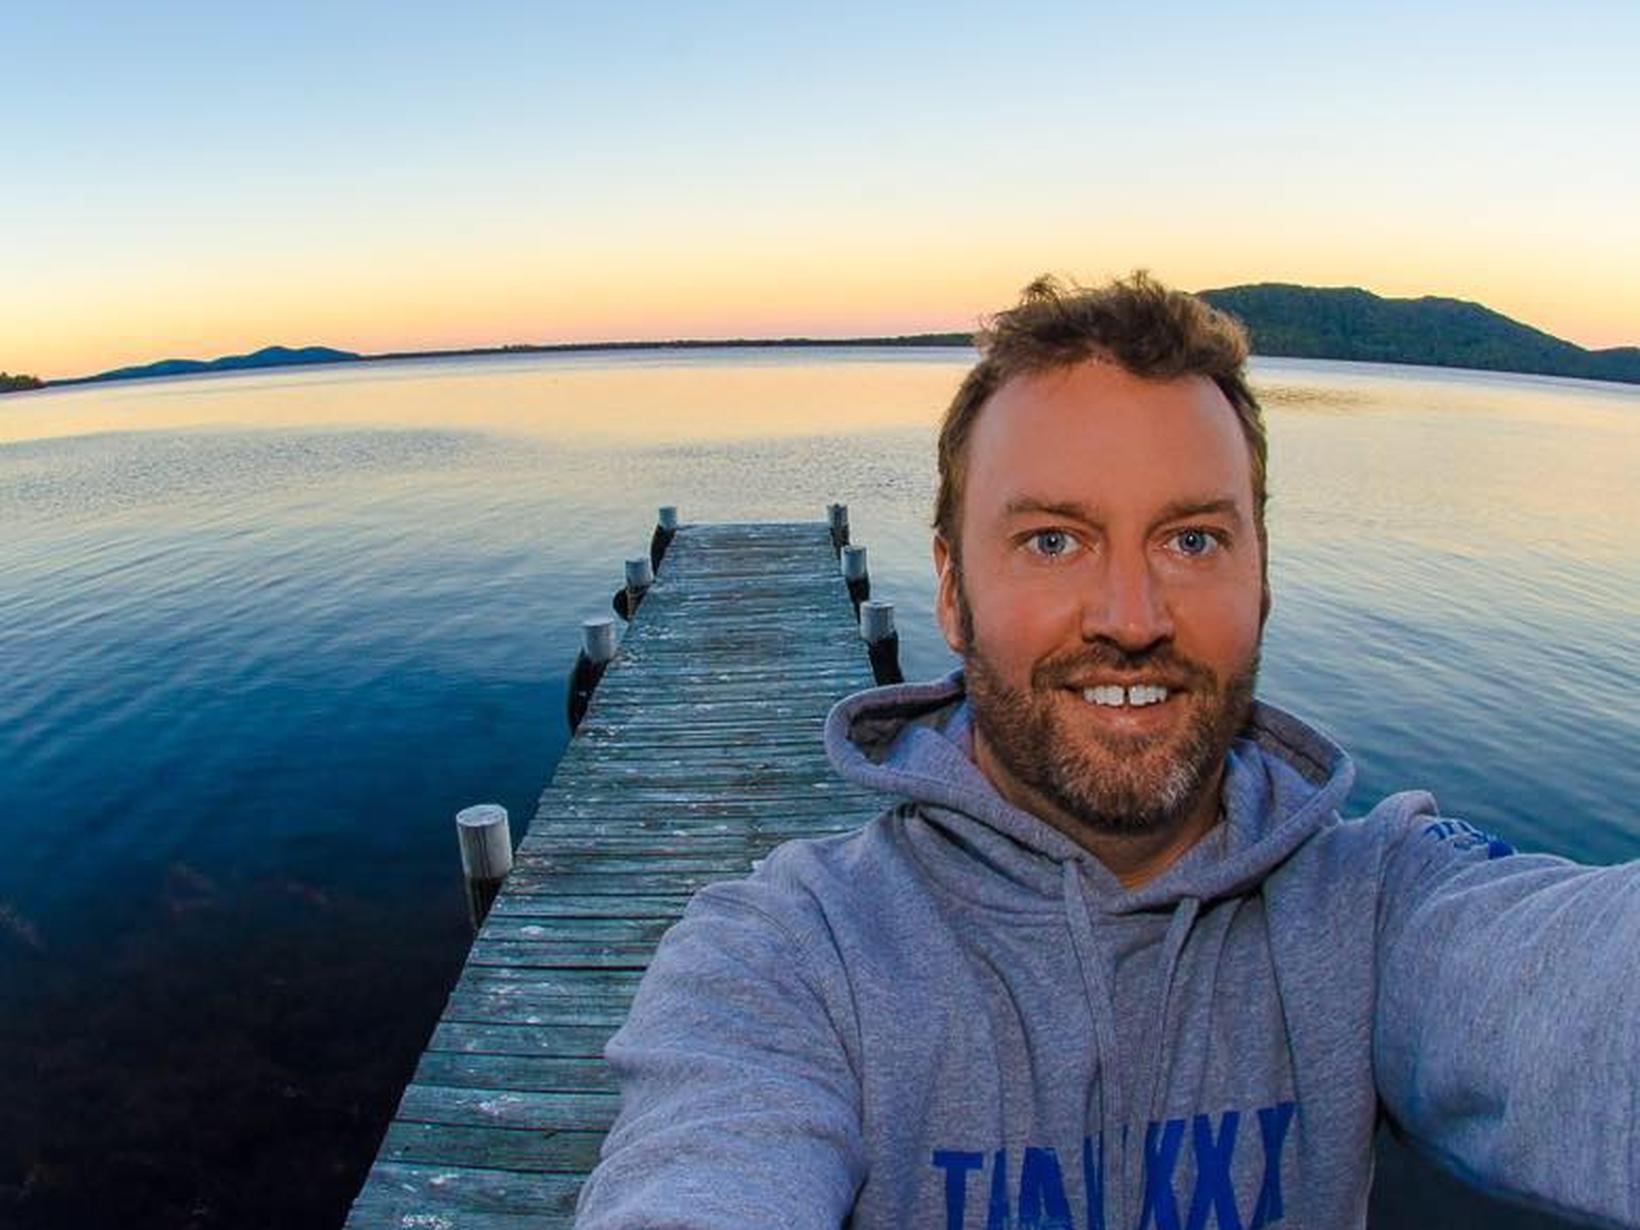 Scott from Sydney, New South Wales, Australia